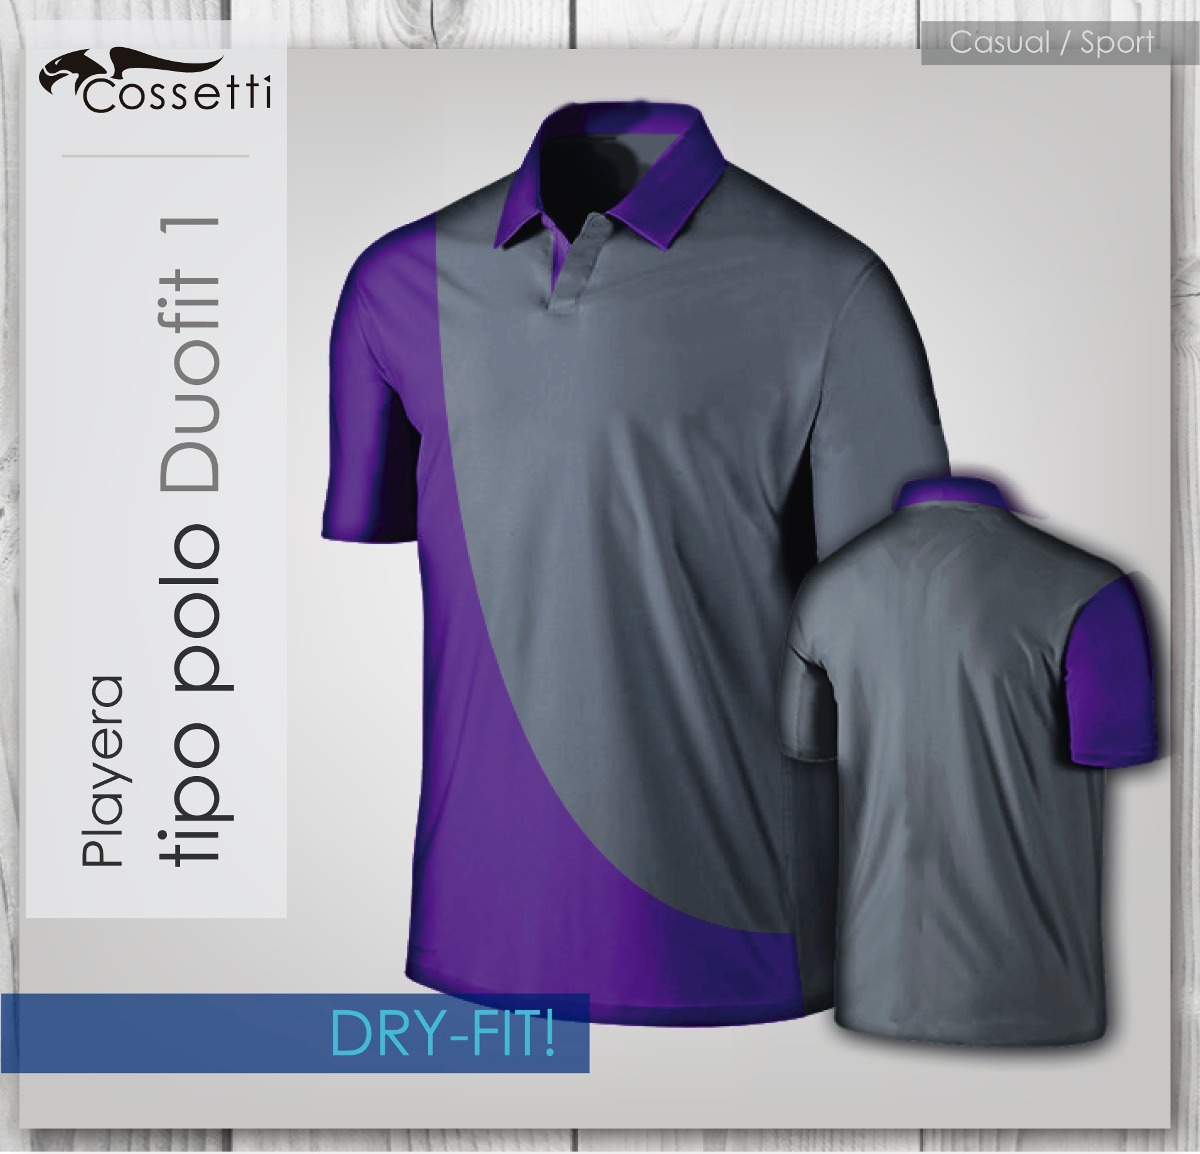 Playera Tipo Polo Dry-fit! Corte Duo-fit Combina Colores ... fc1039fe458d3